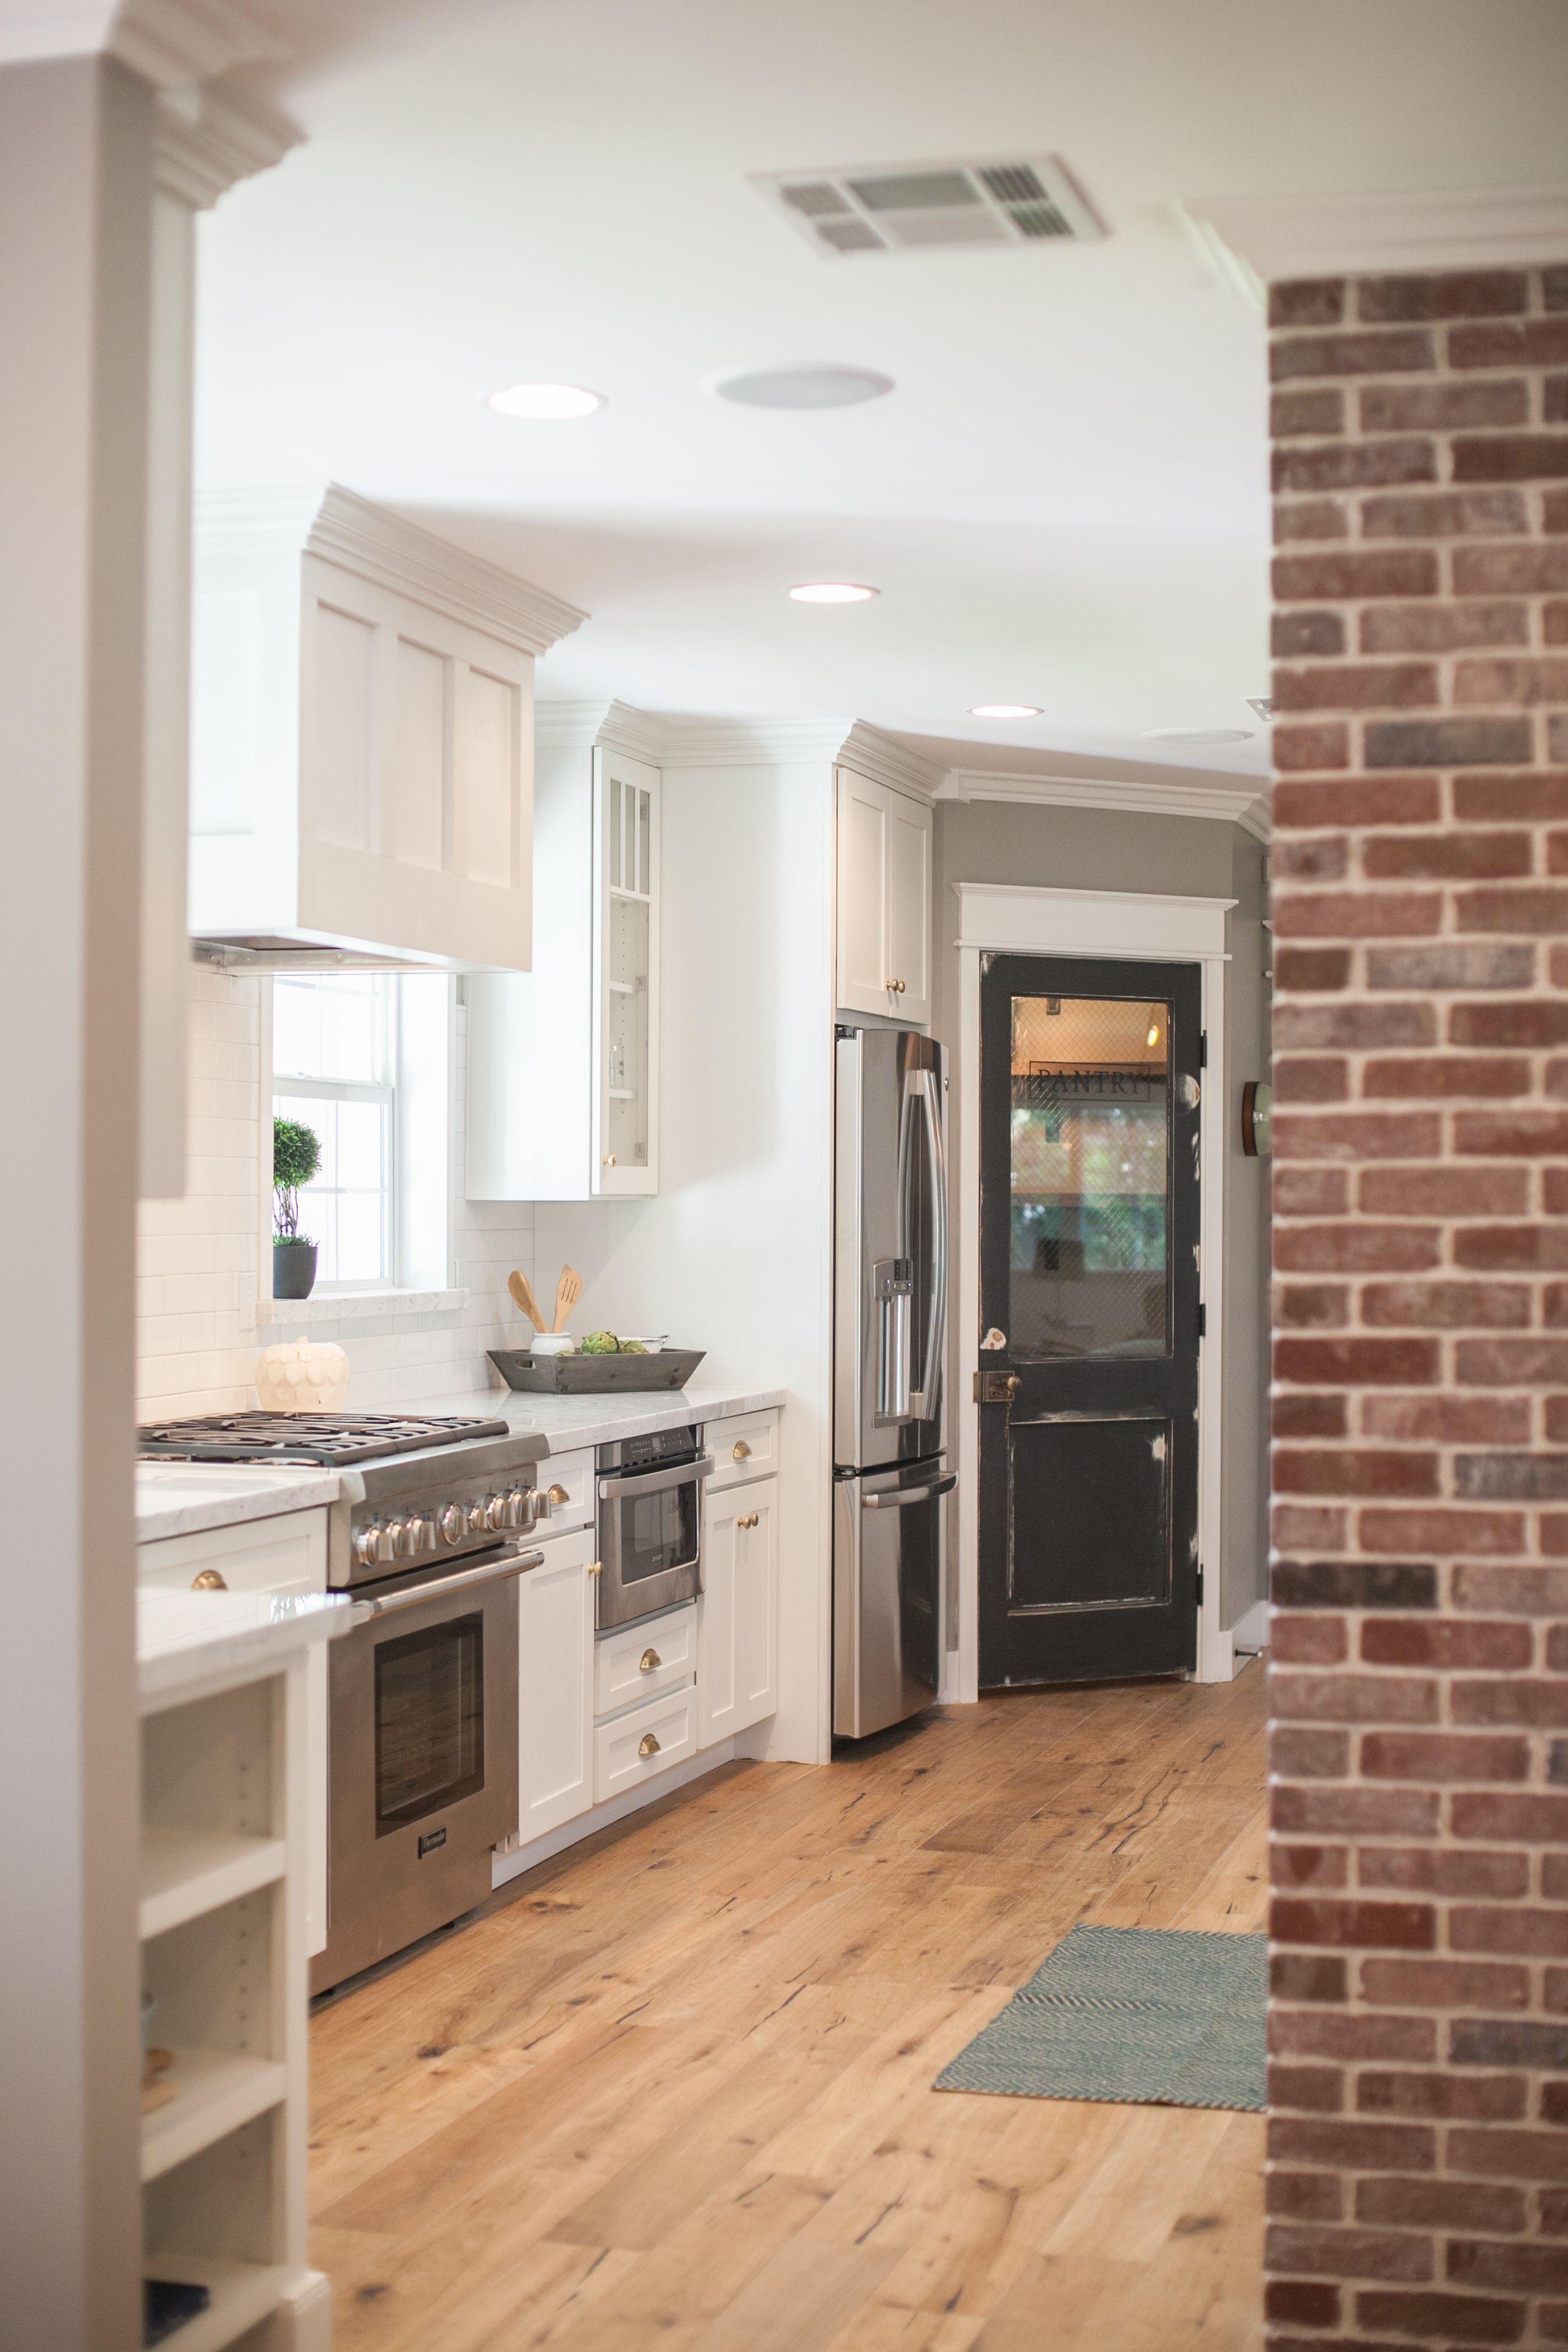 Best White Cabinets Black Rustic Pantry Door Exposed Brick 400 x 300